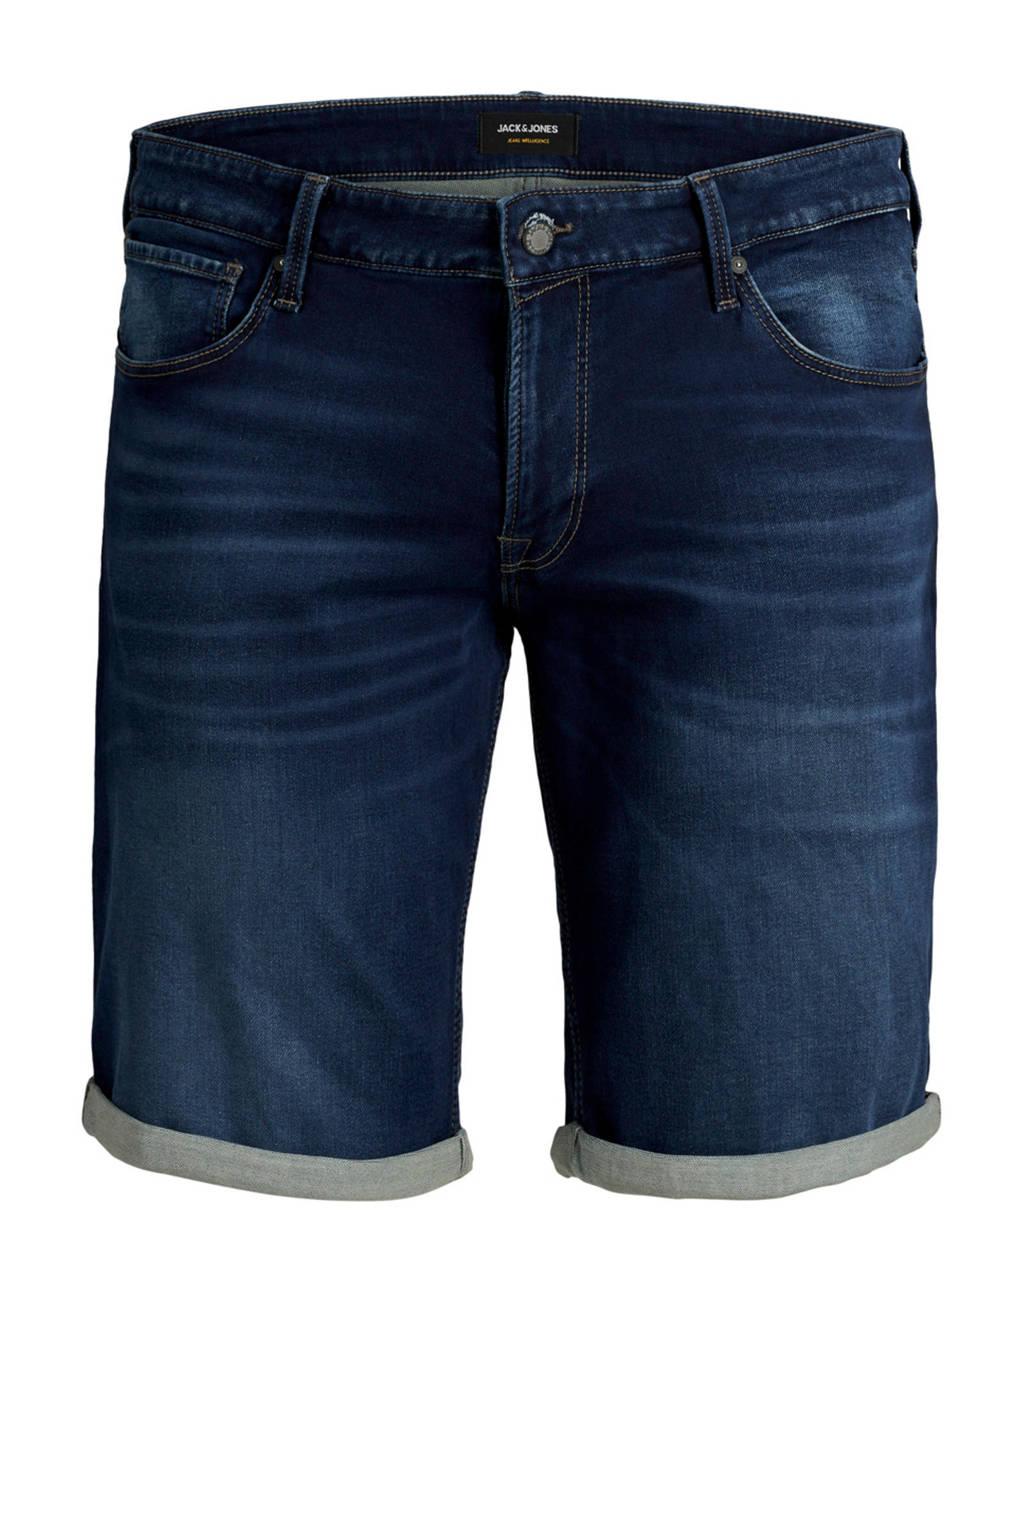 JACK & JONES PLUS SIZE regular fit jeans short, Dark denim